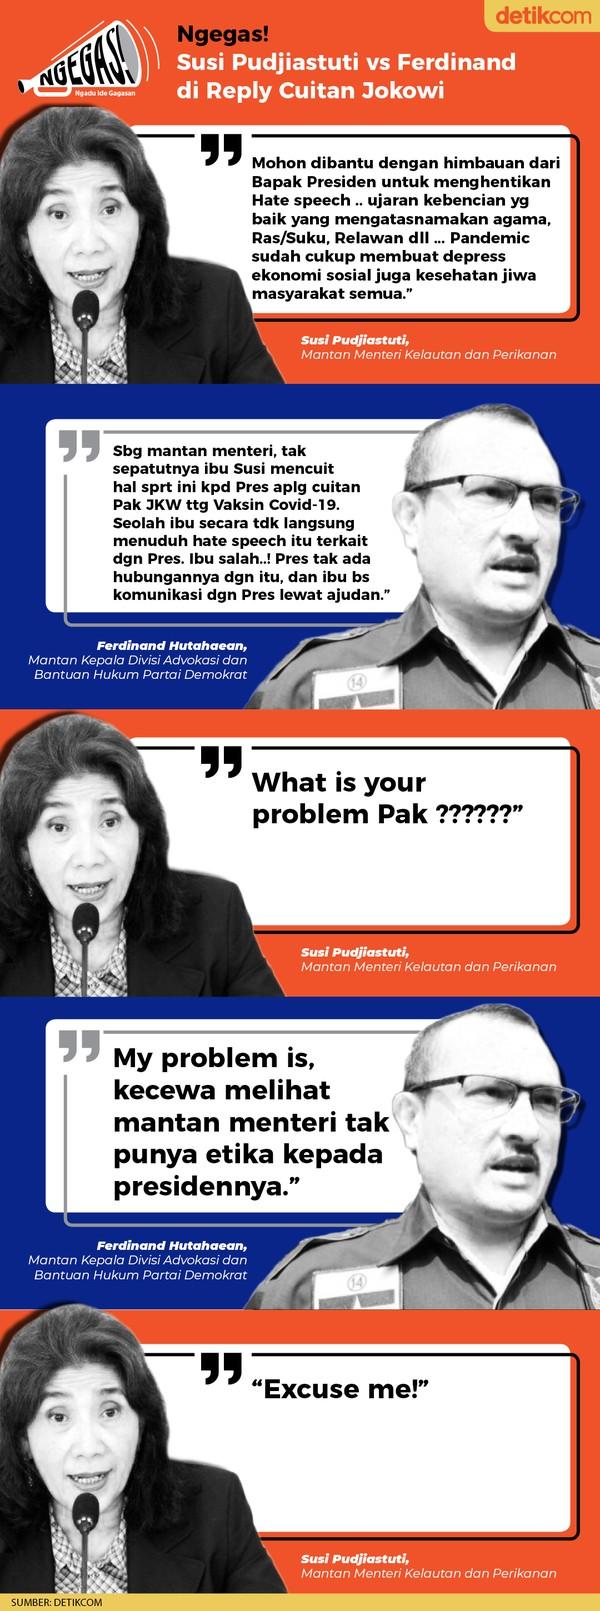 Ngegas! Susi Pudjiastuti vs Ferdinand di Reply Cuitan Jokowi